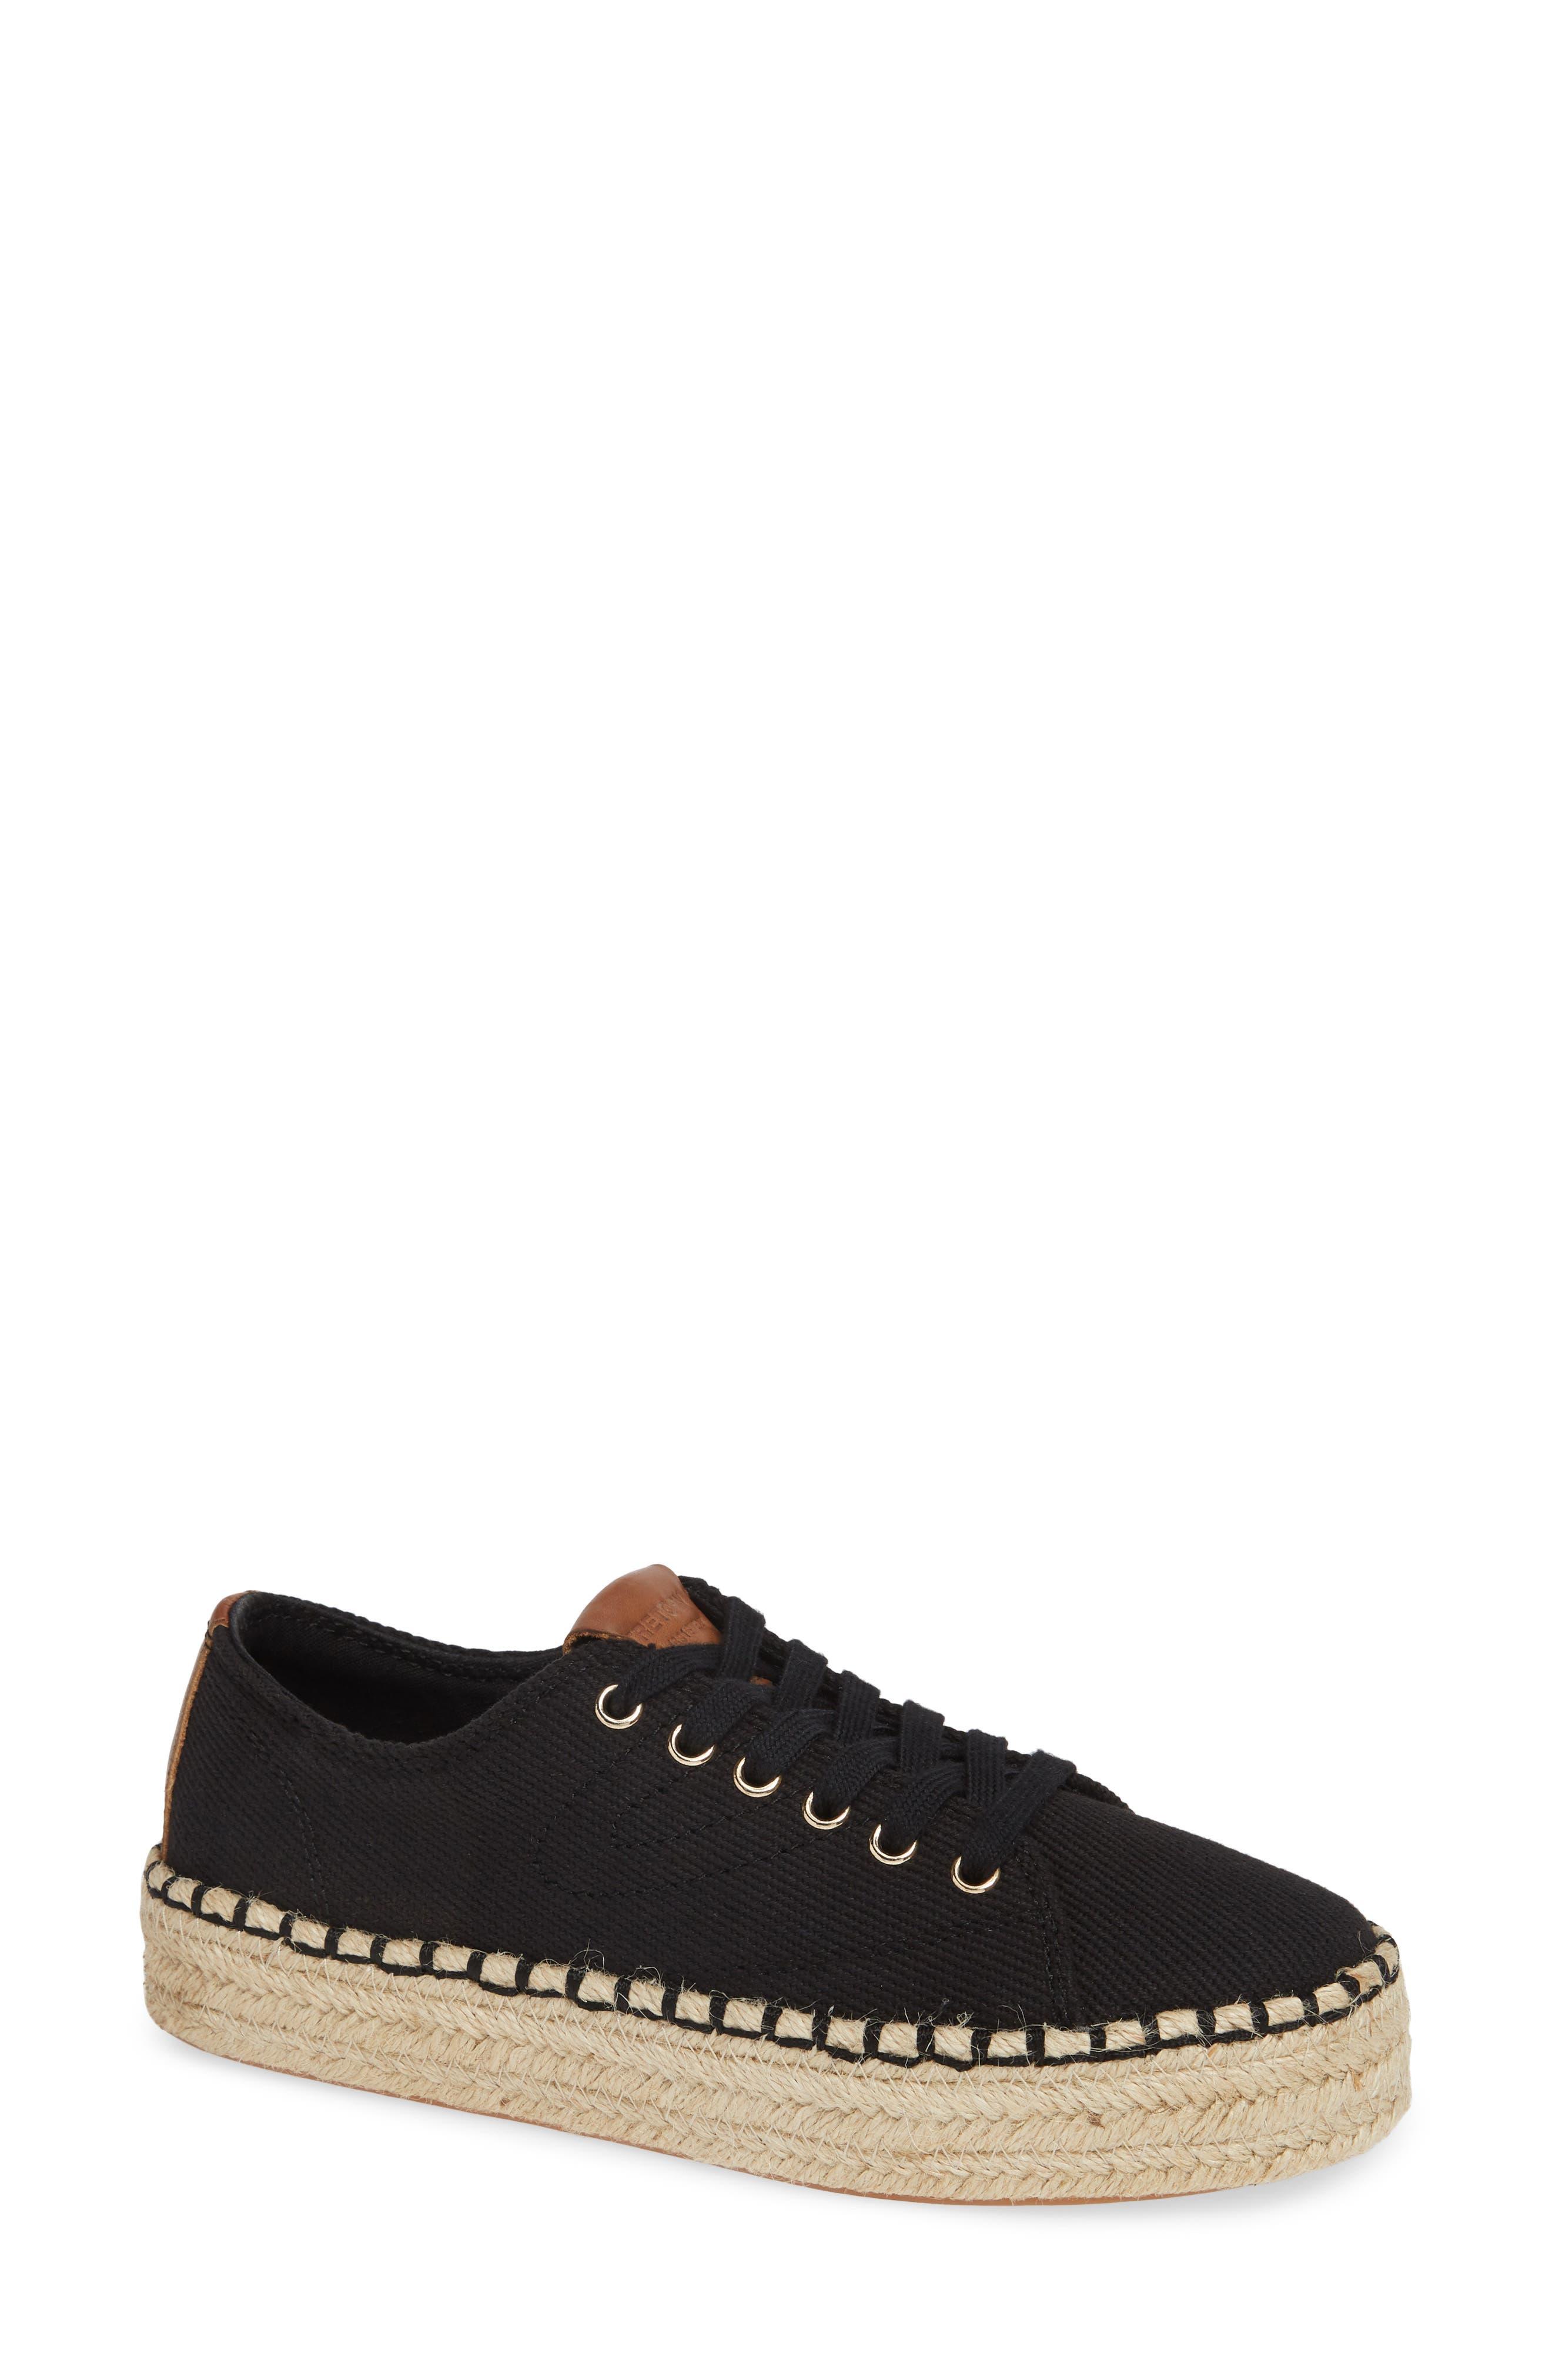 Platform Espadrille Sneaker,                             Main thumbnail 1, color,                             BLACK/ KONA TAN FABRIC